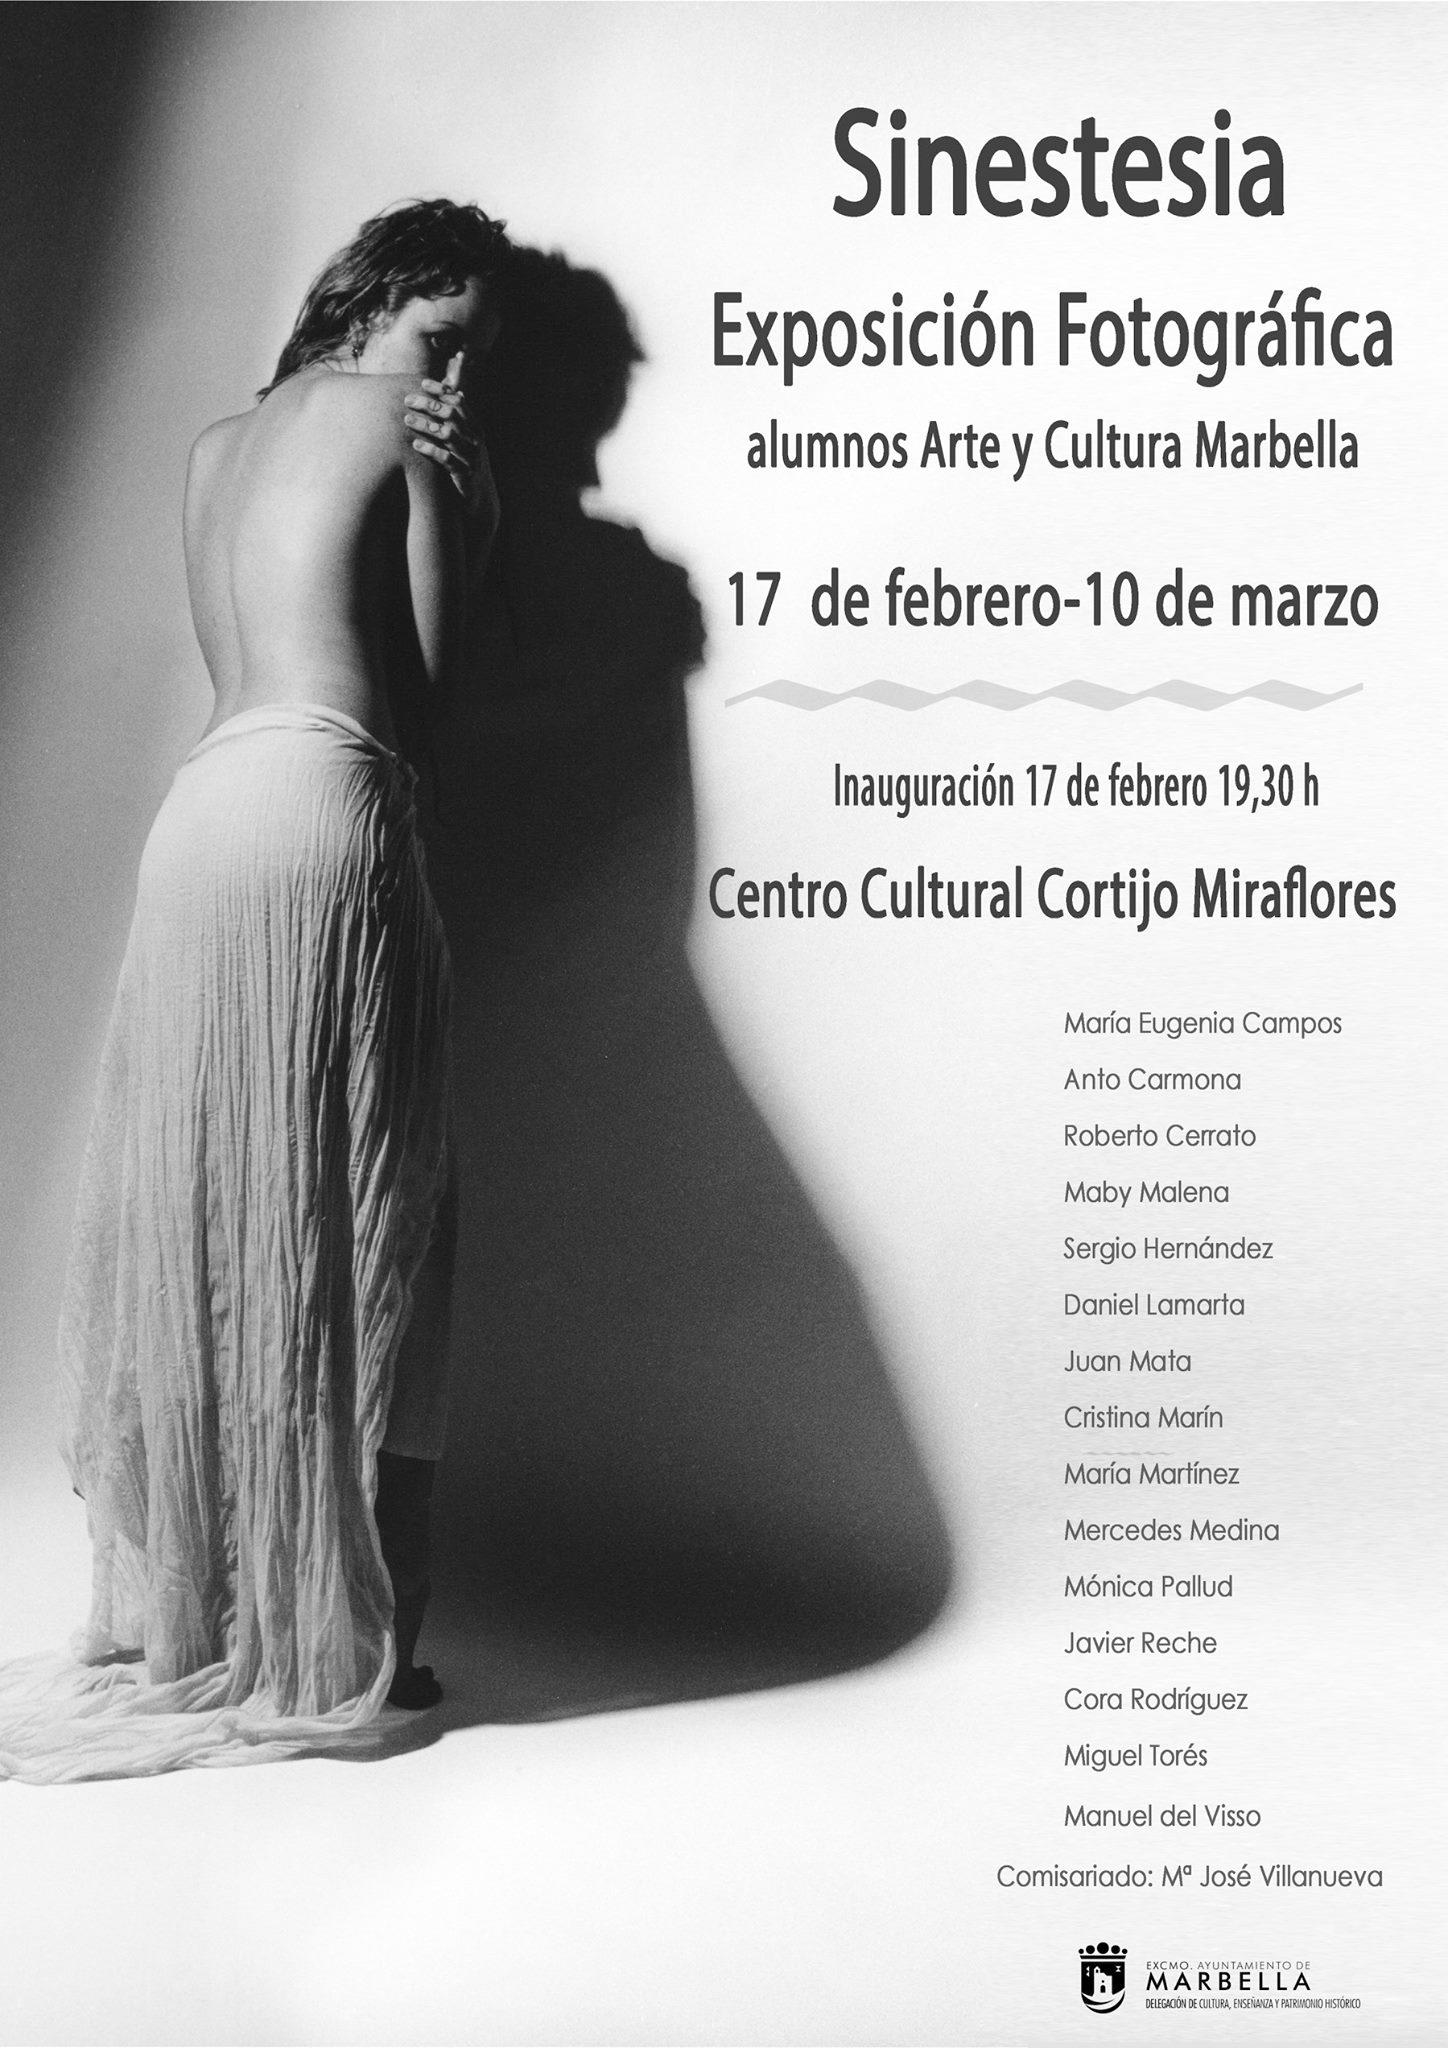 Sinestesia alumnos arte y cultura marbella emilio dominguez fotograf as - Casa emilio benalmadena ...